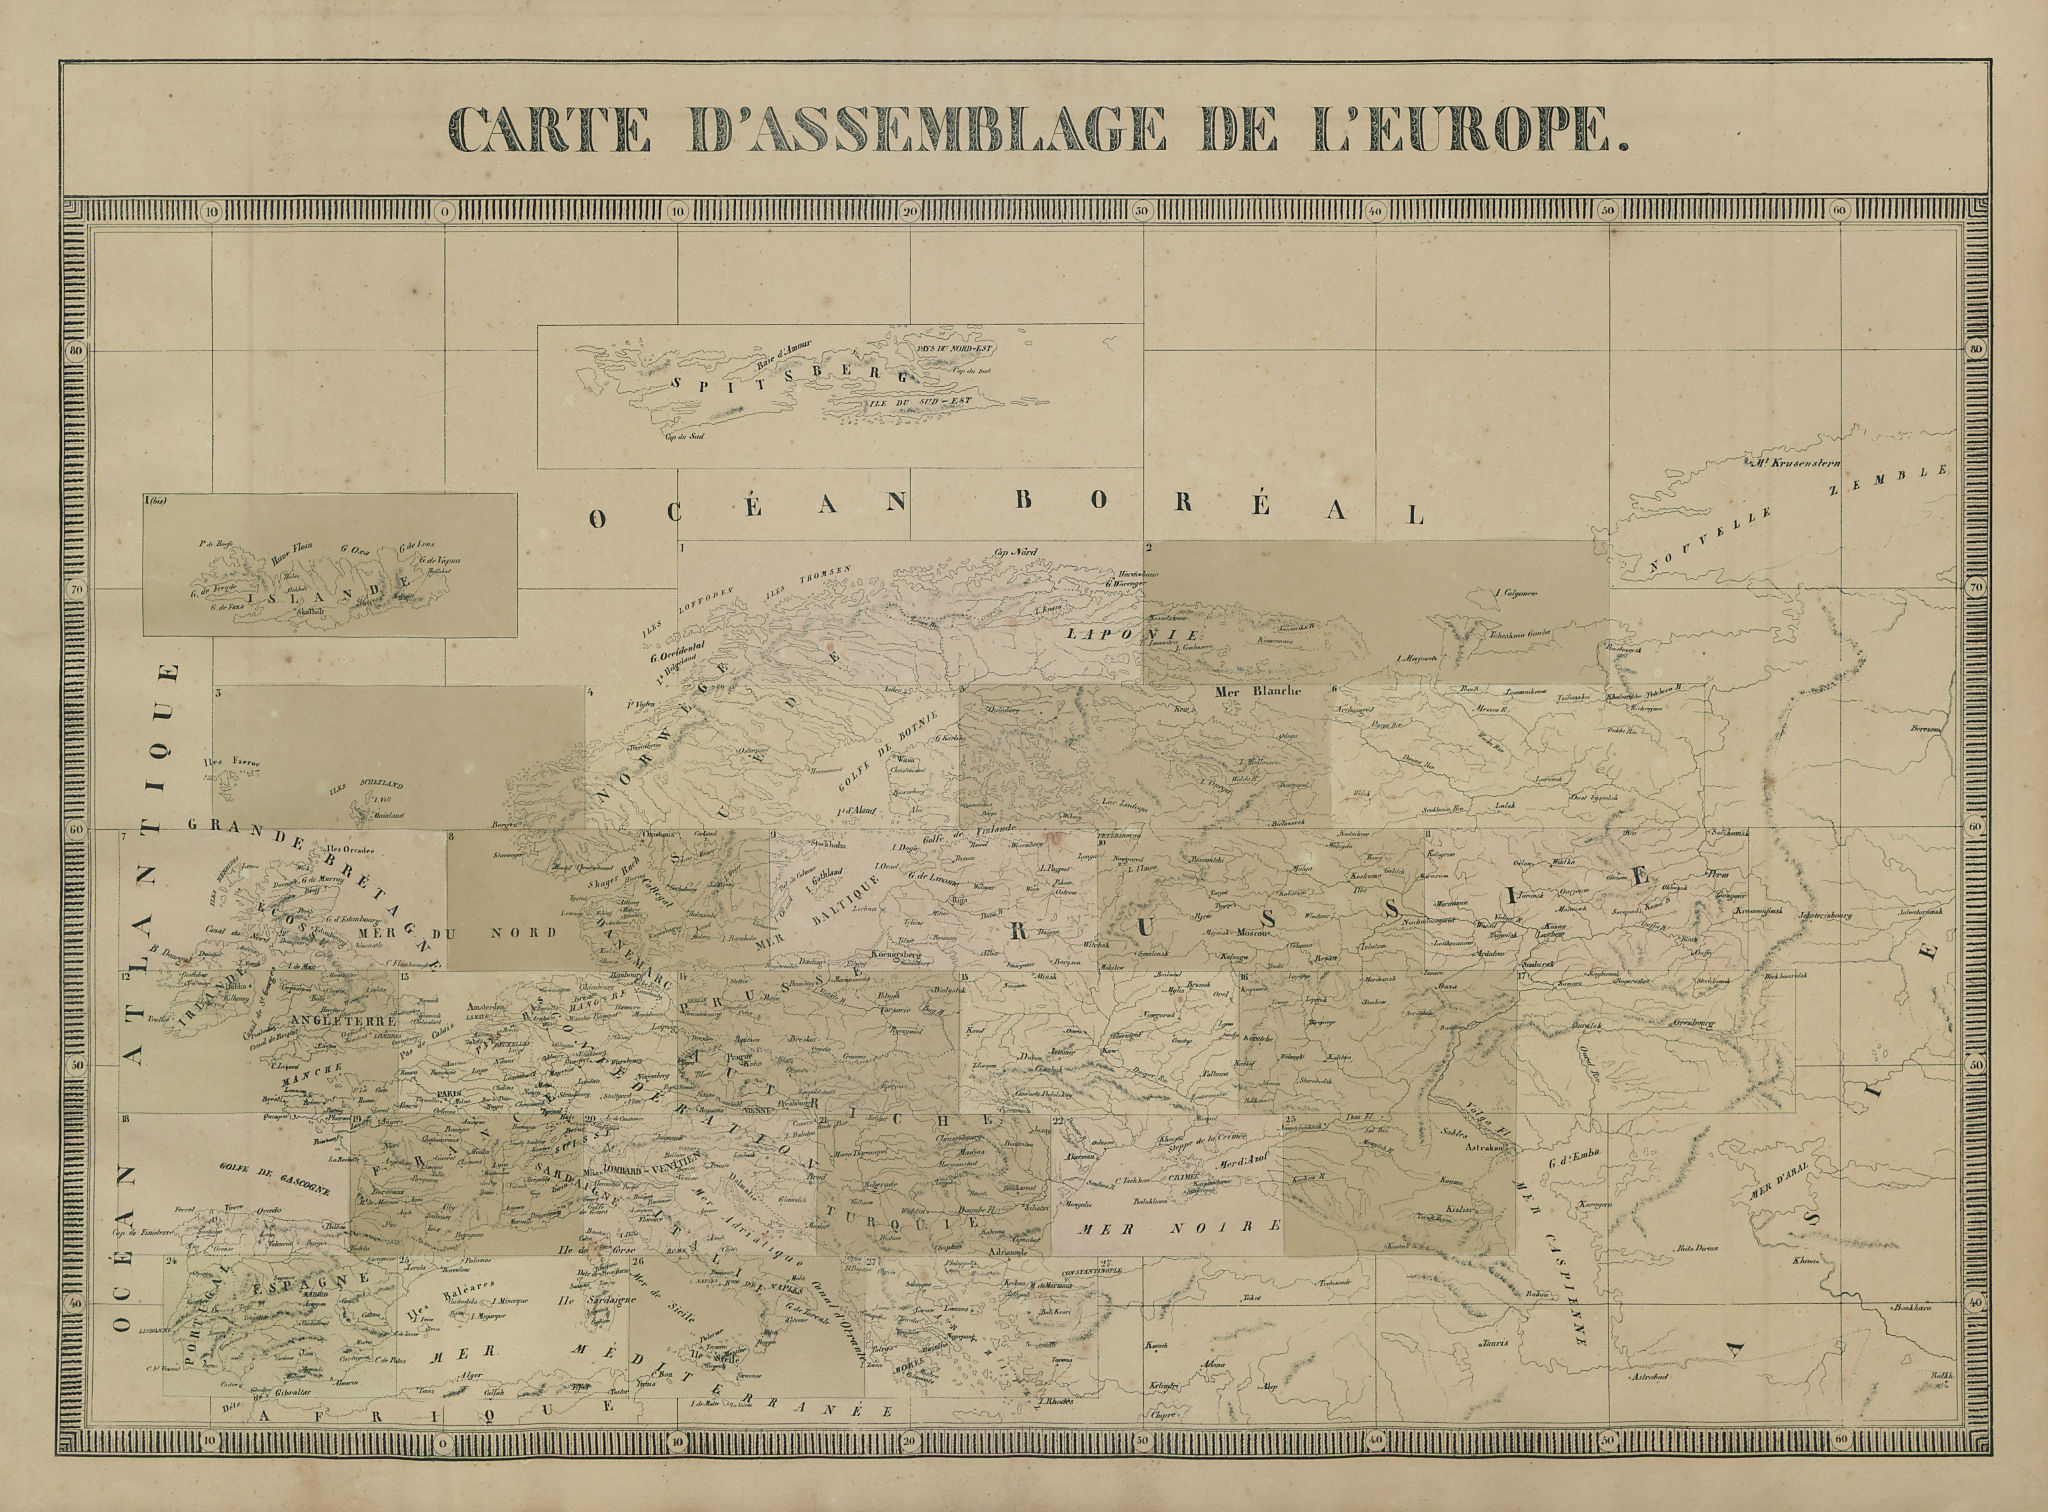 Carte d'Assemblage de l'Europe. Index map. VANDERMAELEN 1827 old antique